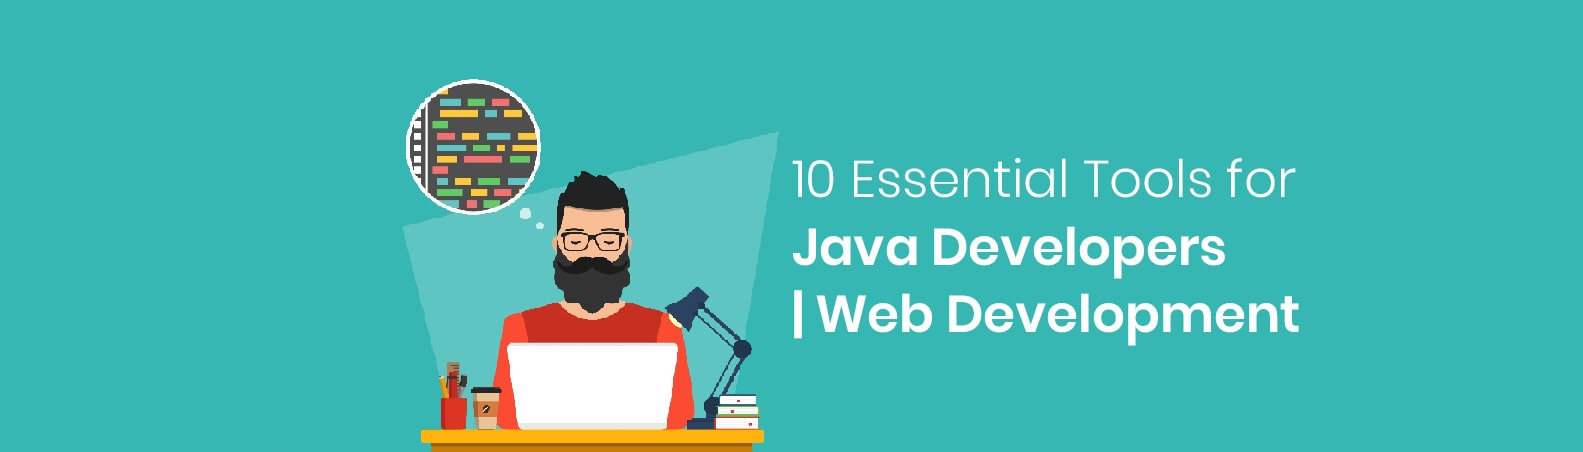 10 Essential Tools for Java Developers | Web Development